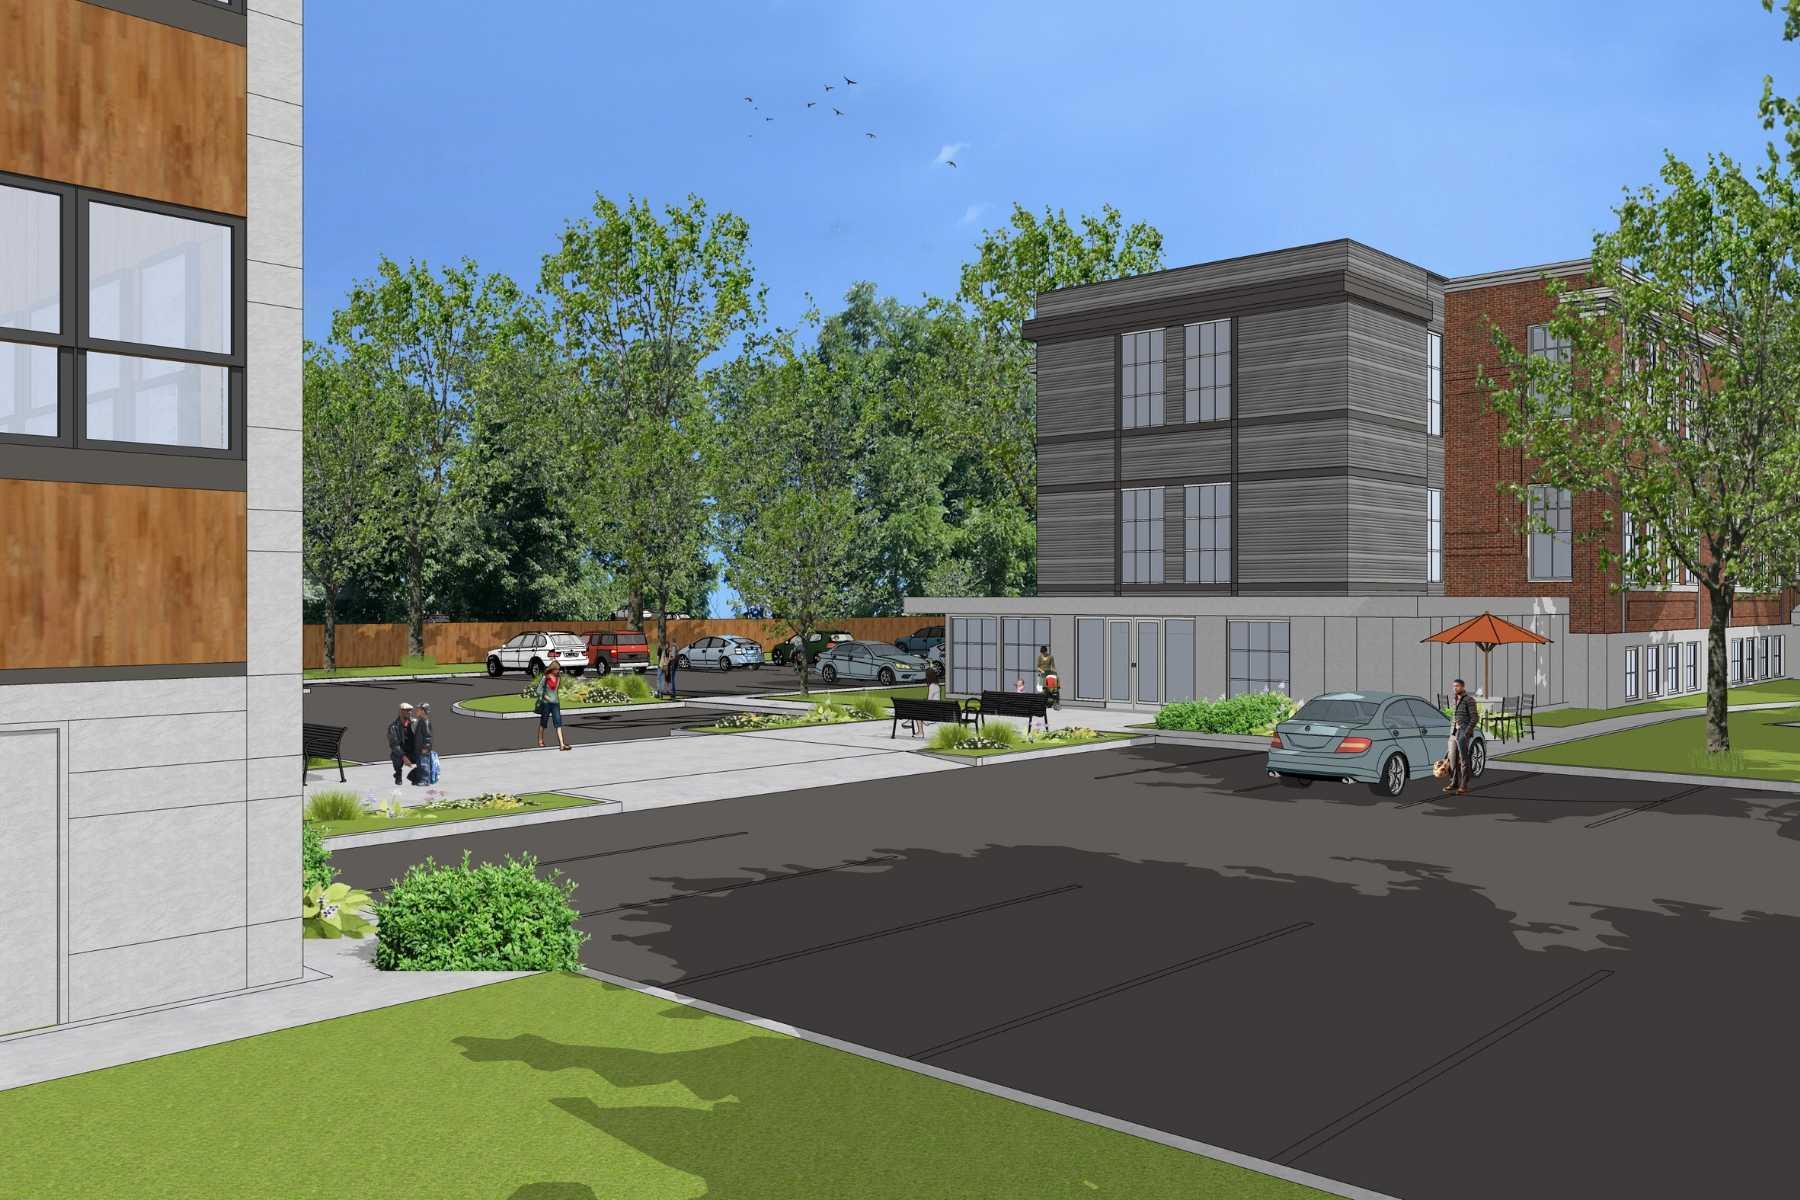 4-CapstoneCommunities-property-McElwainSchoolApartments-Bridgewater.jpg